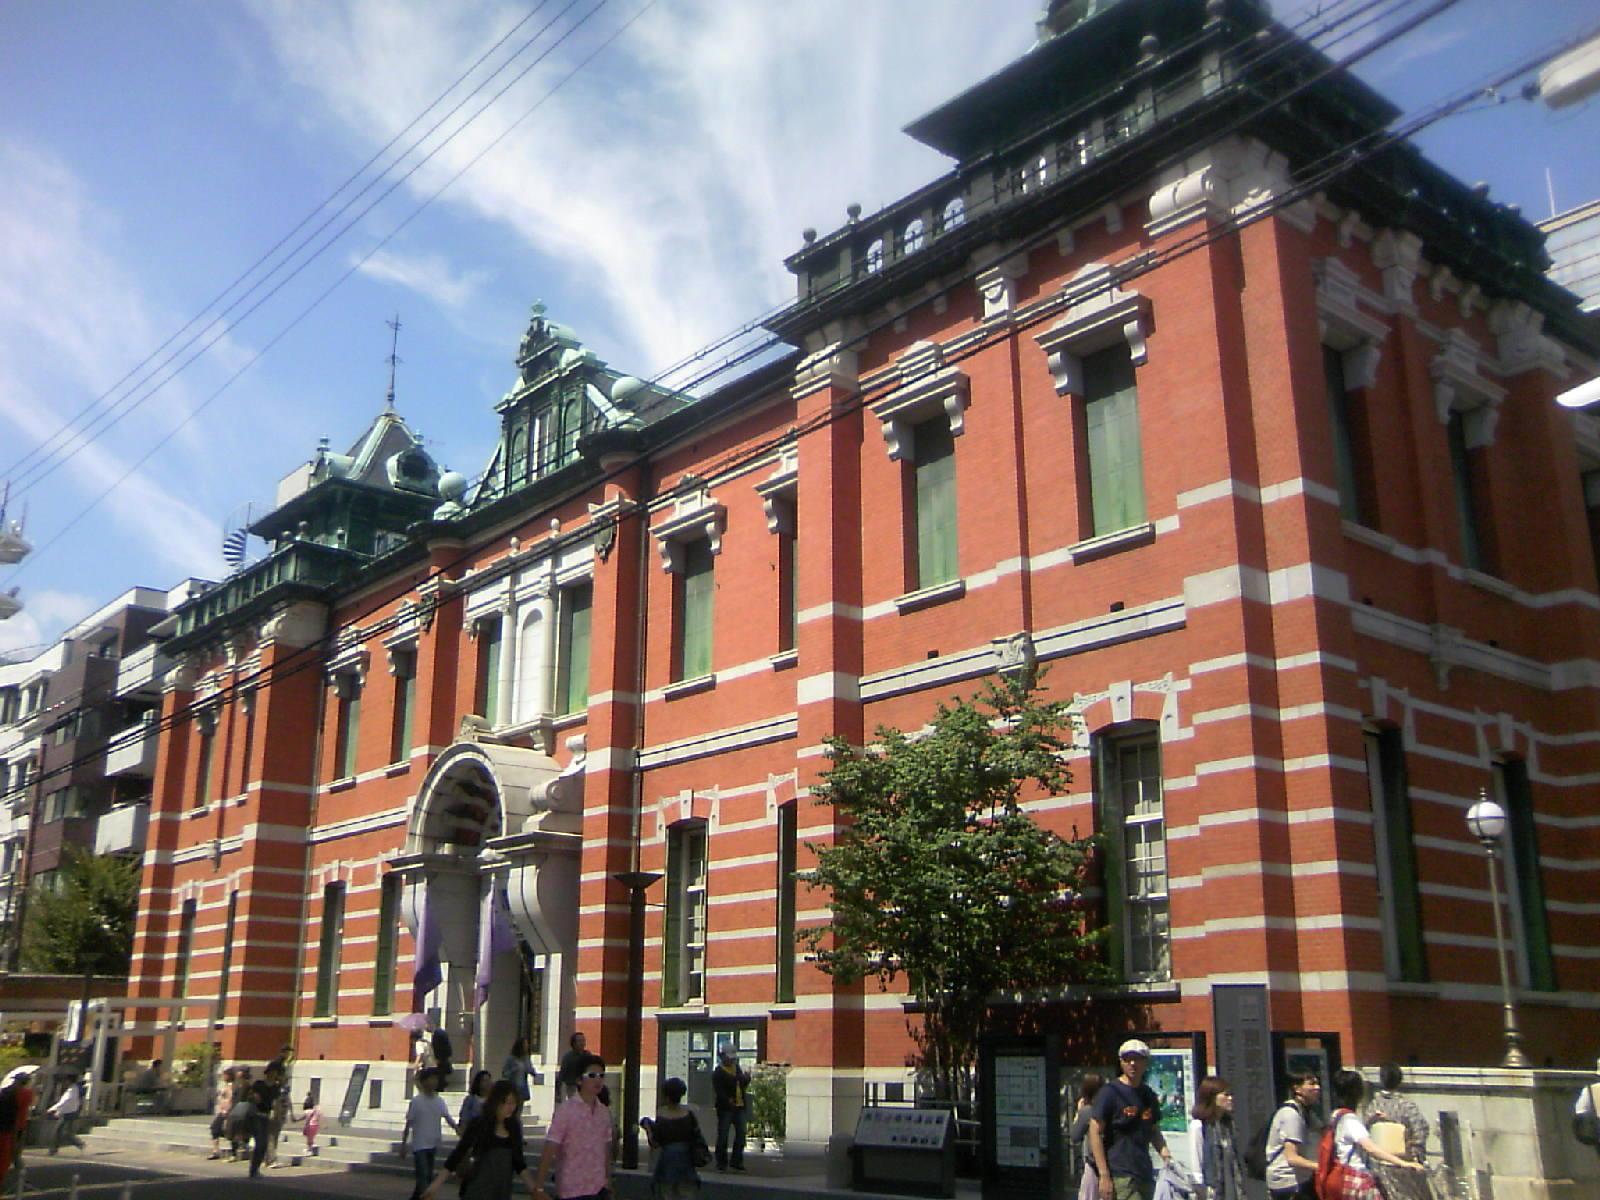 語り得の世界 京都文化博物館